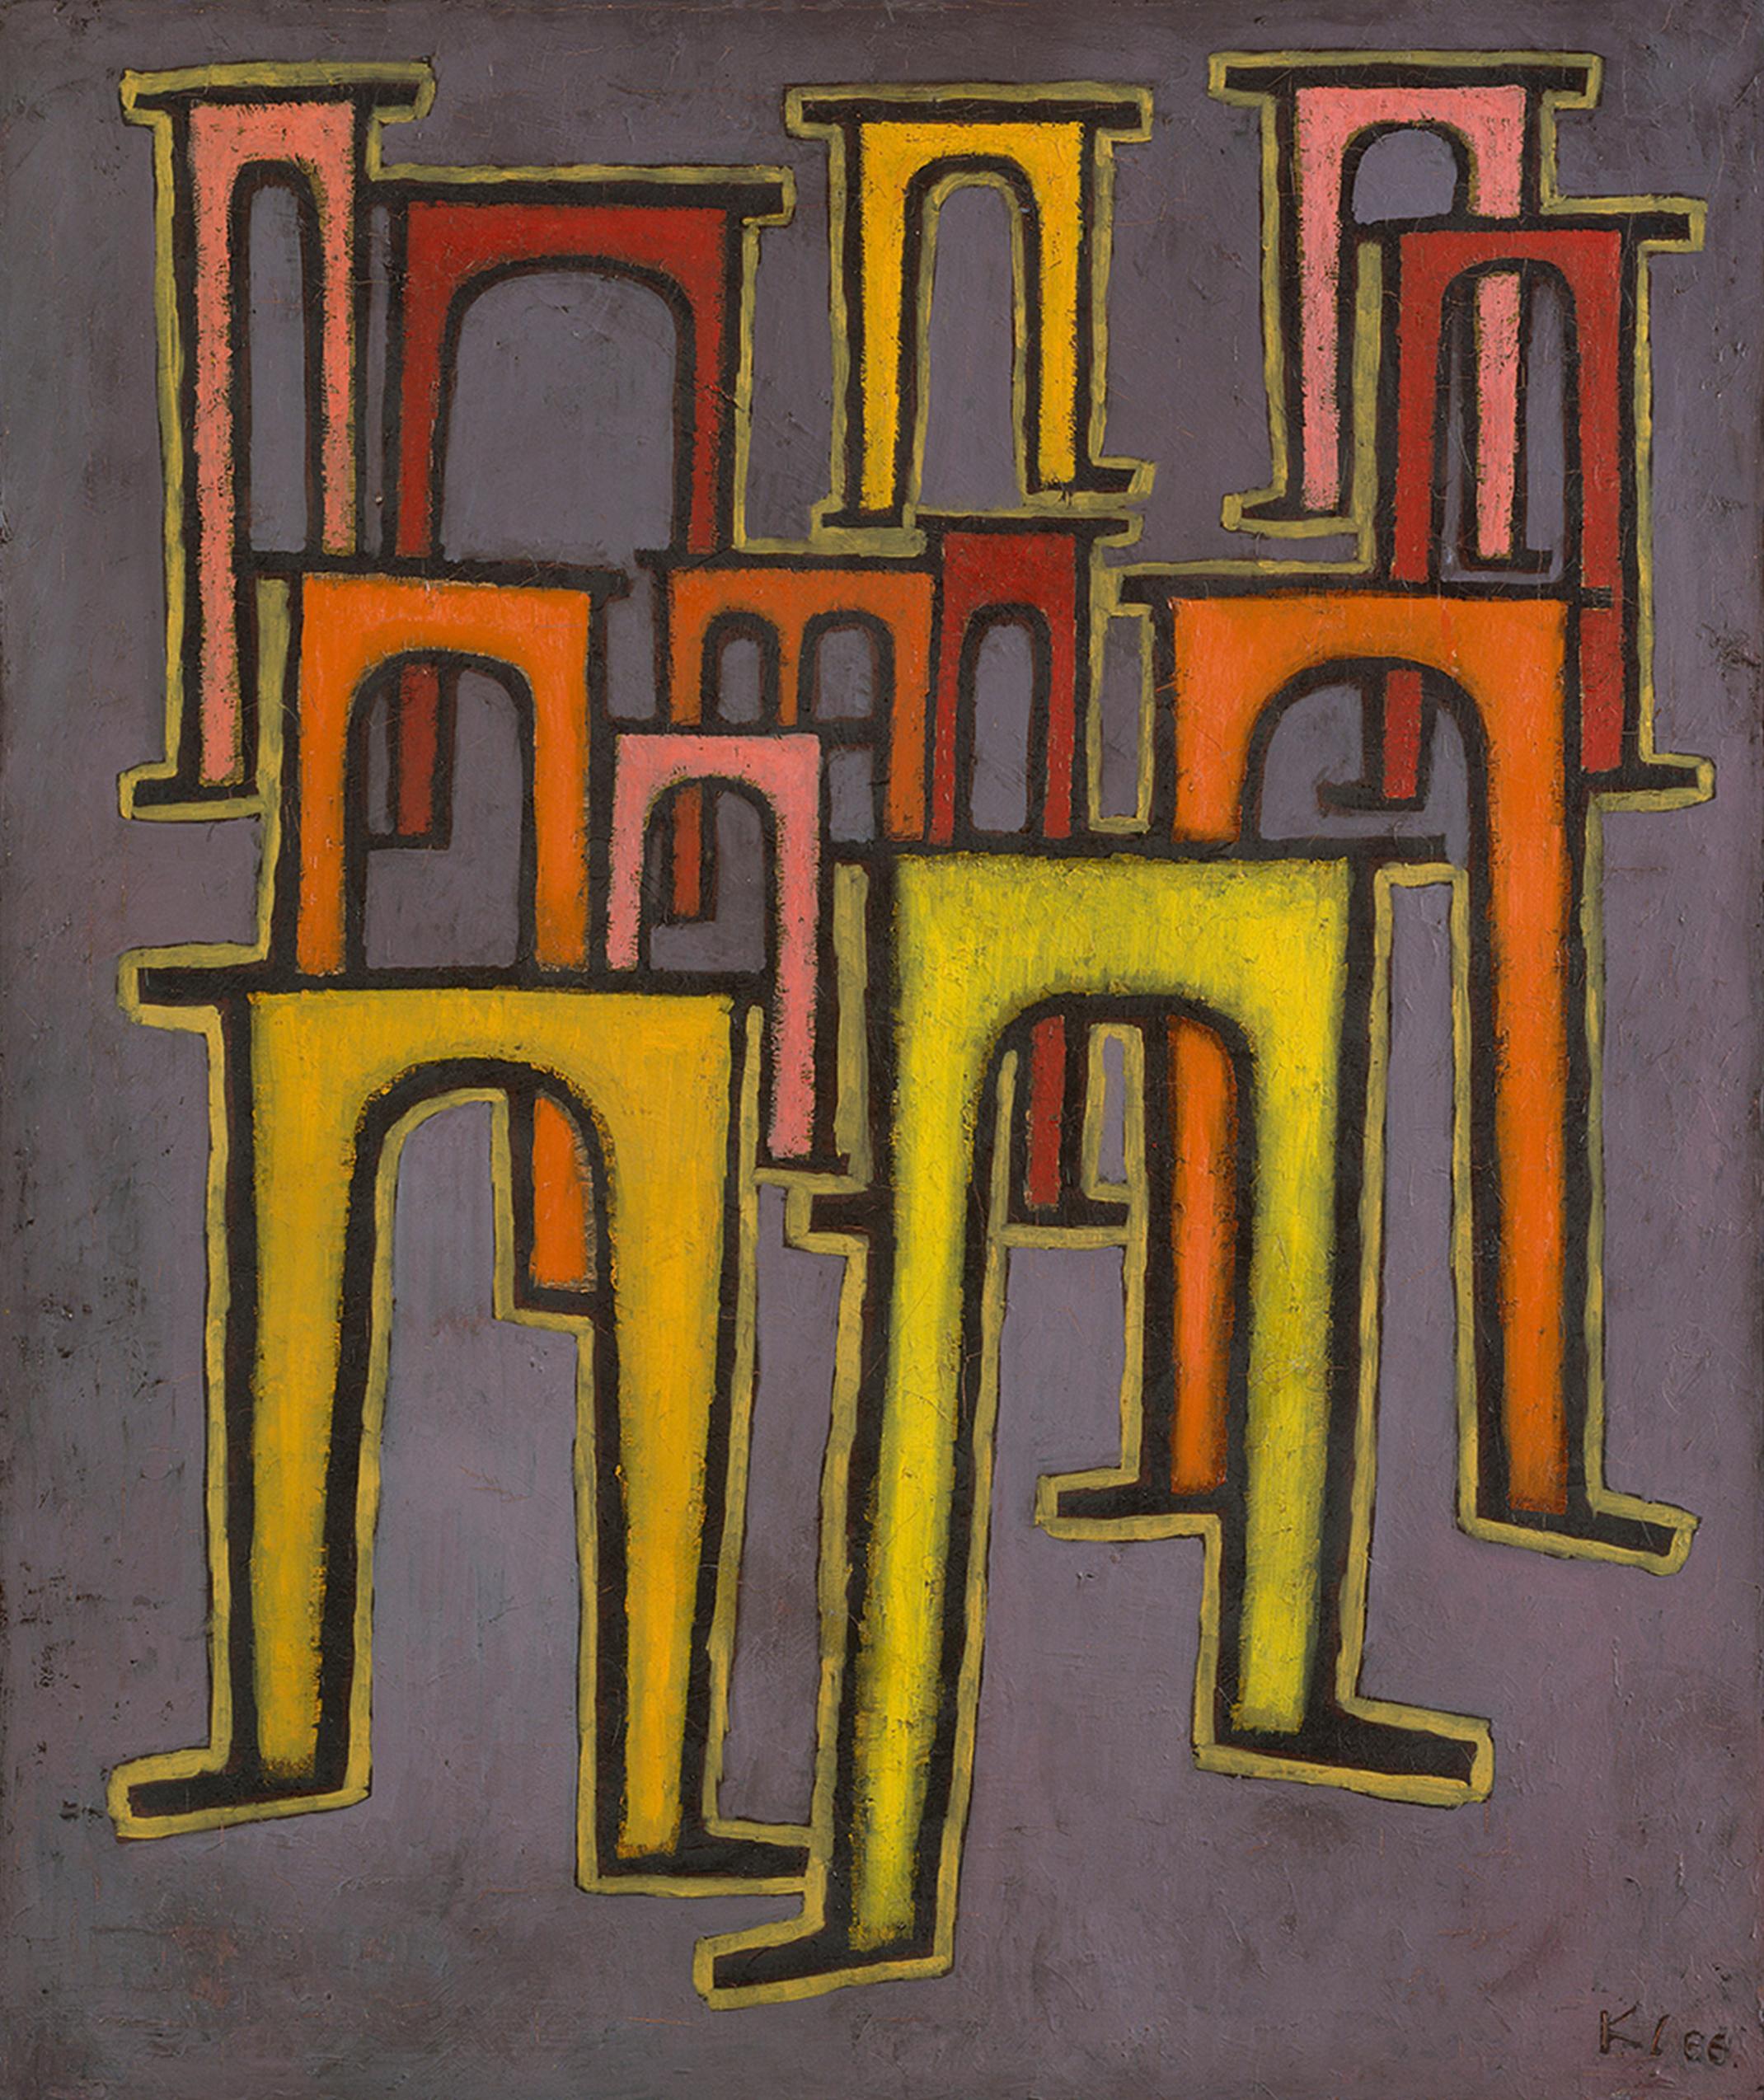 Inv. HK 5165 Paul Klee Revolution Des Viaductes, 1937 Öl Auf Leinwand, 60 X  50 Cm. Inv. HK 2899